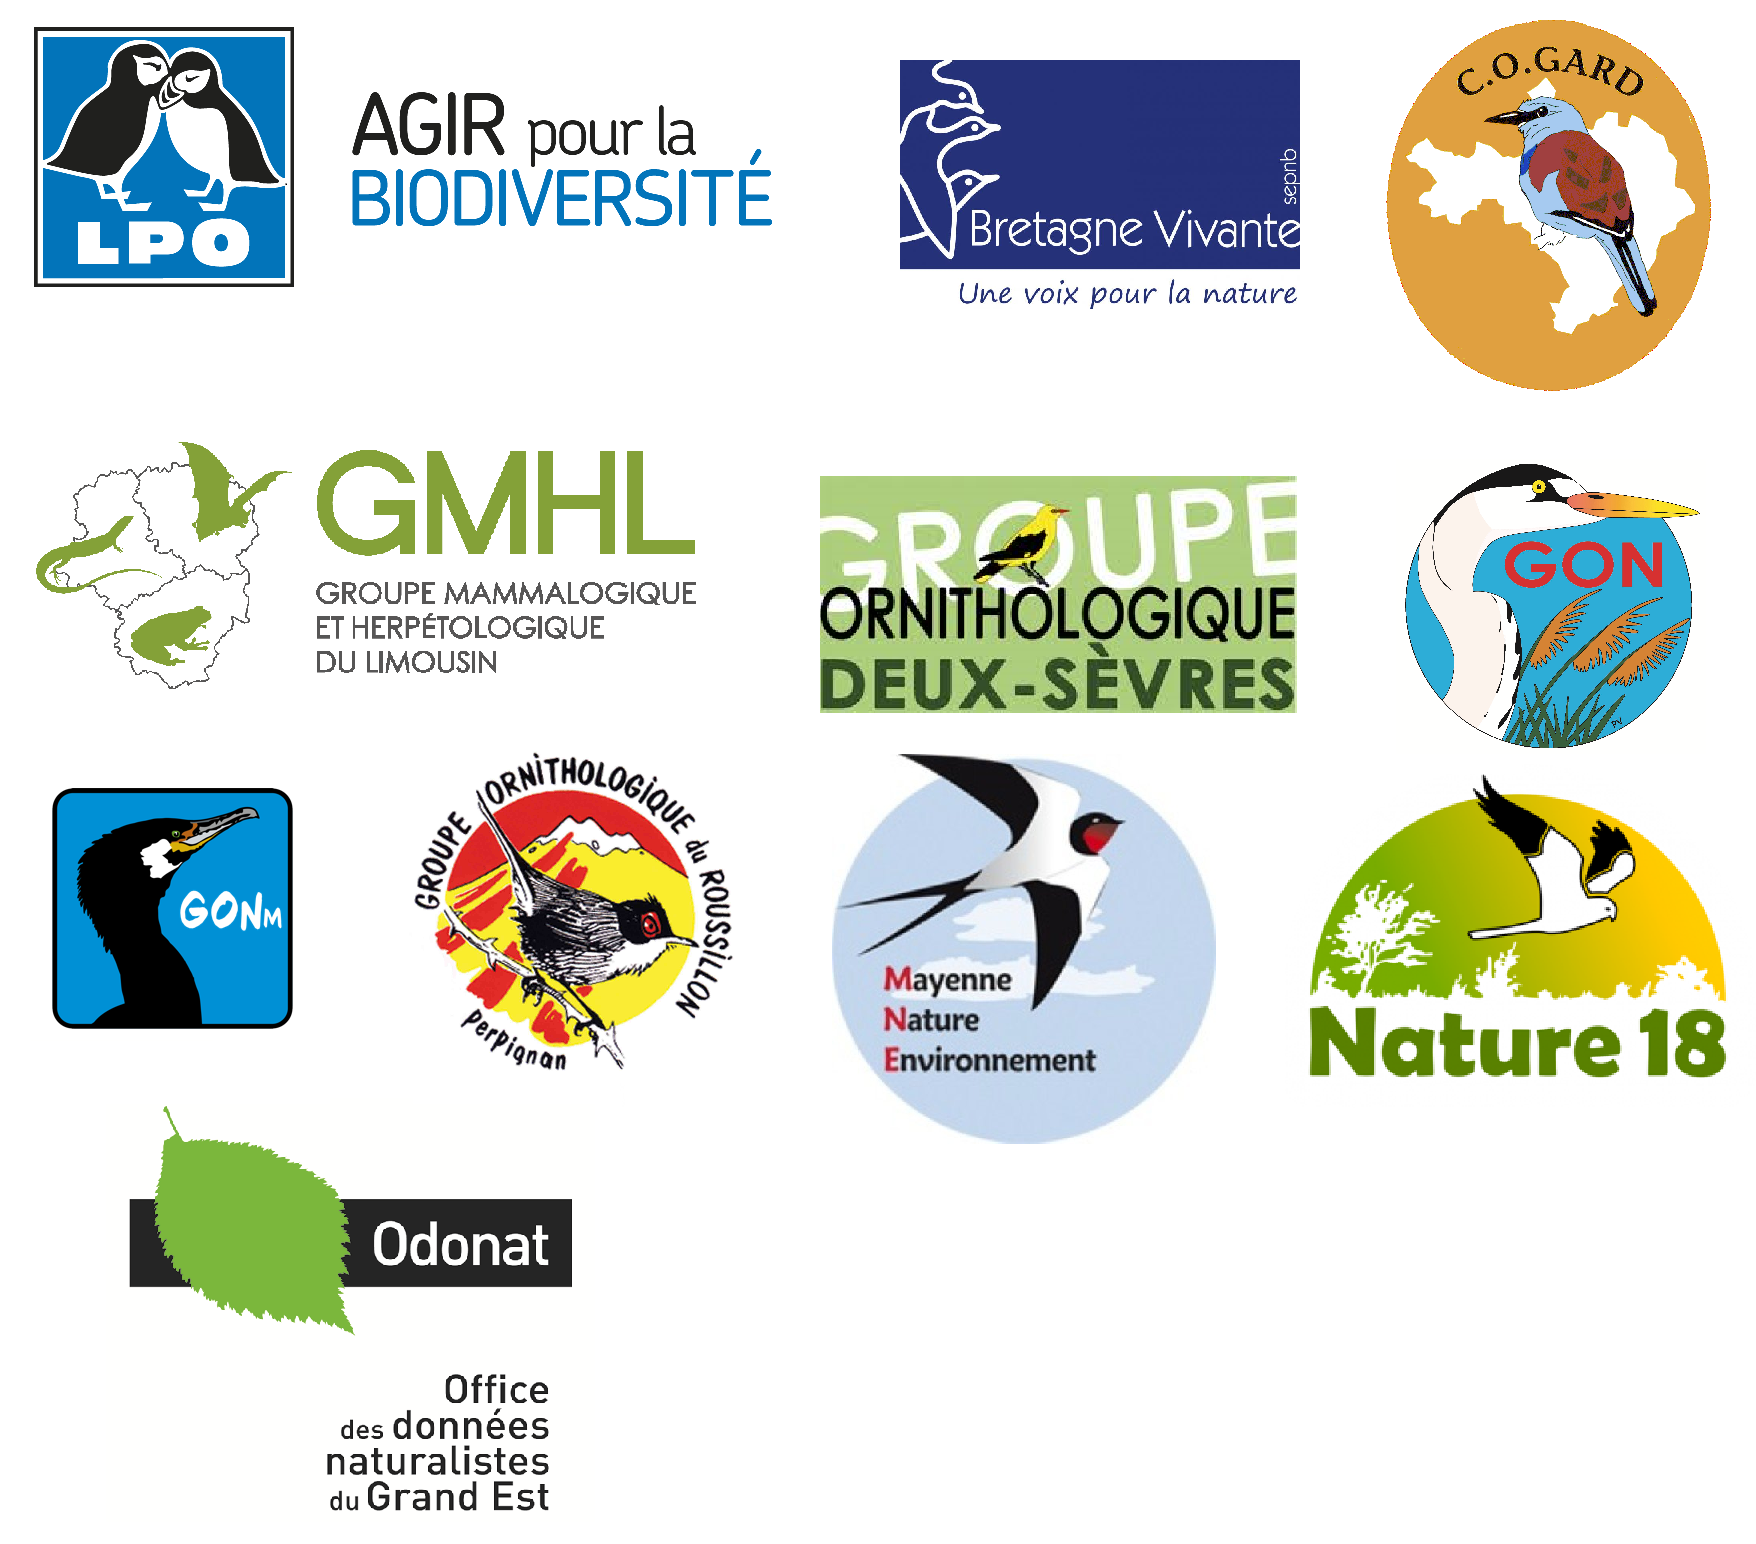 https://cdnfiles1.biolovision.net/www.faune-france.org/userfiles/Partenairesassociatifs/PlancheLogo-1.png